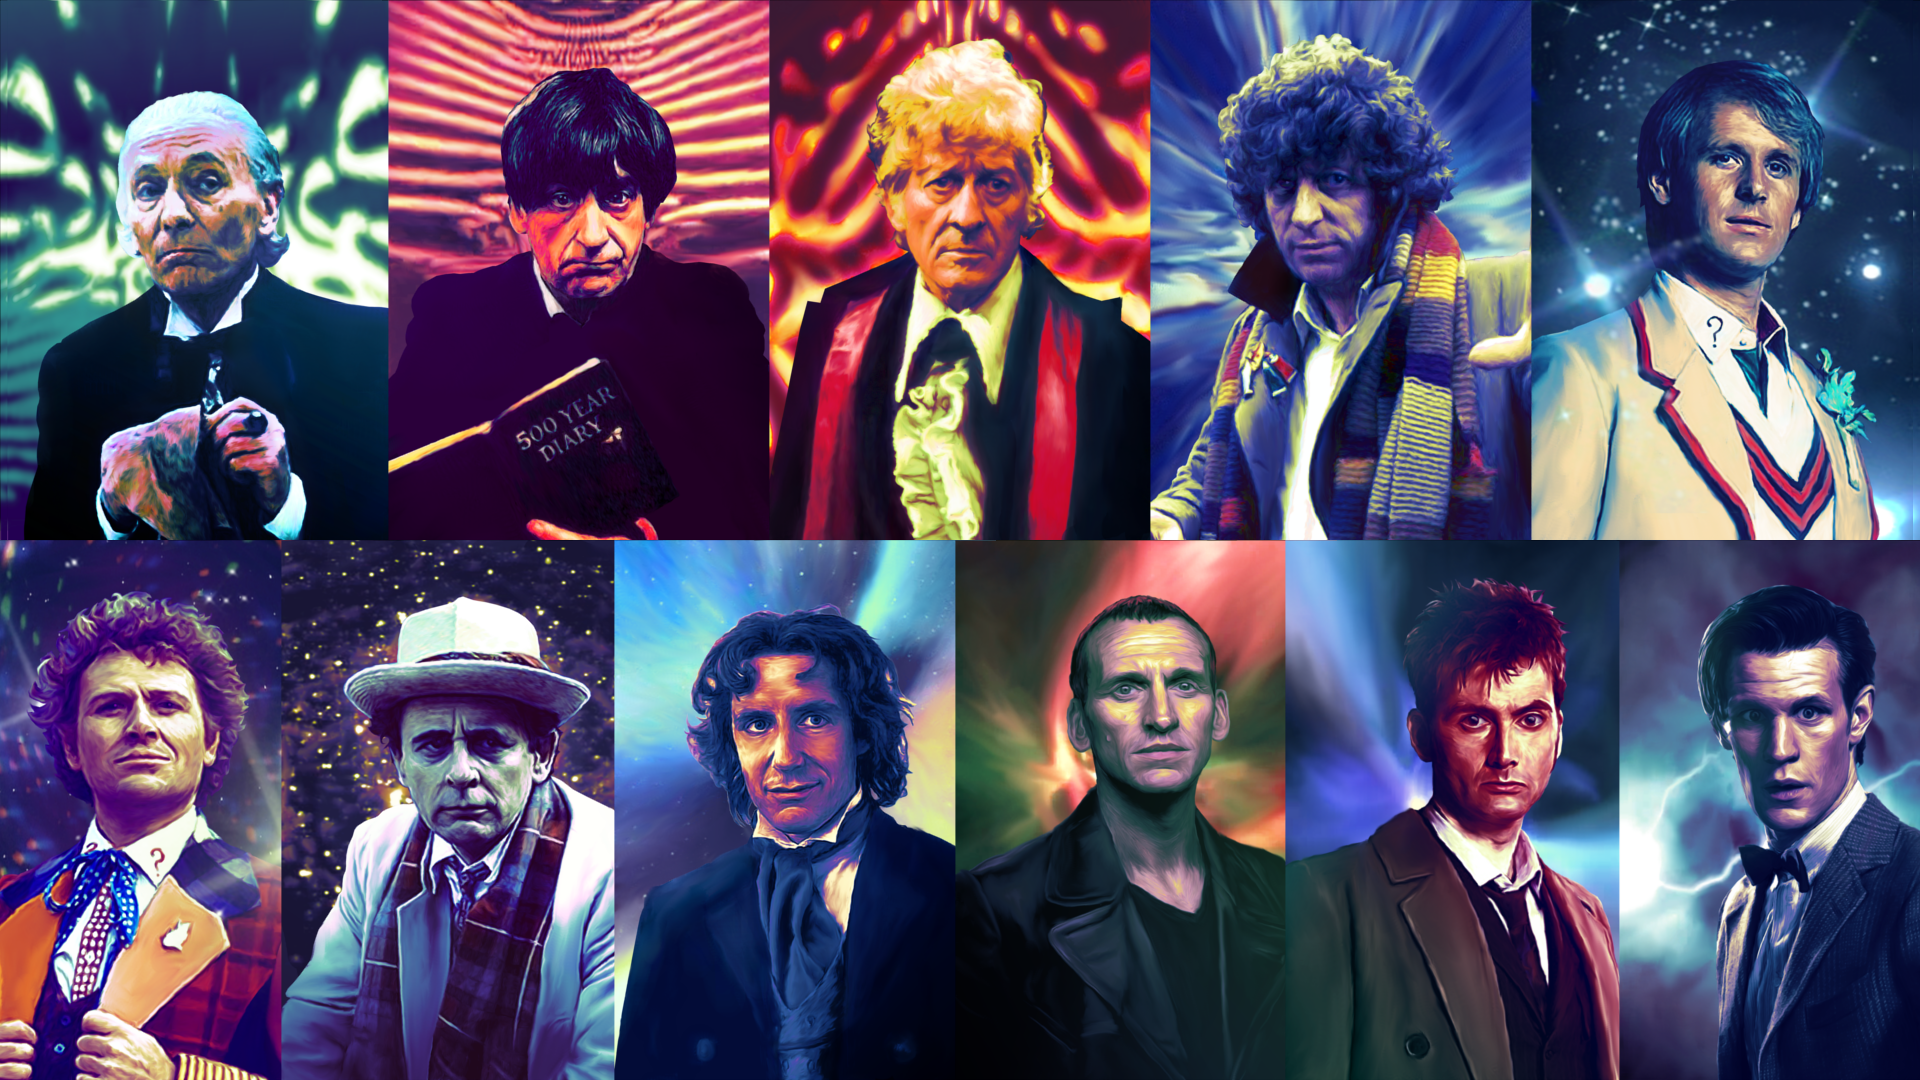 Doctor Who All Doctors Wallpaper - WallpaperSafari  All